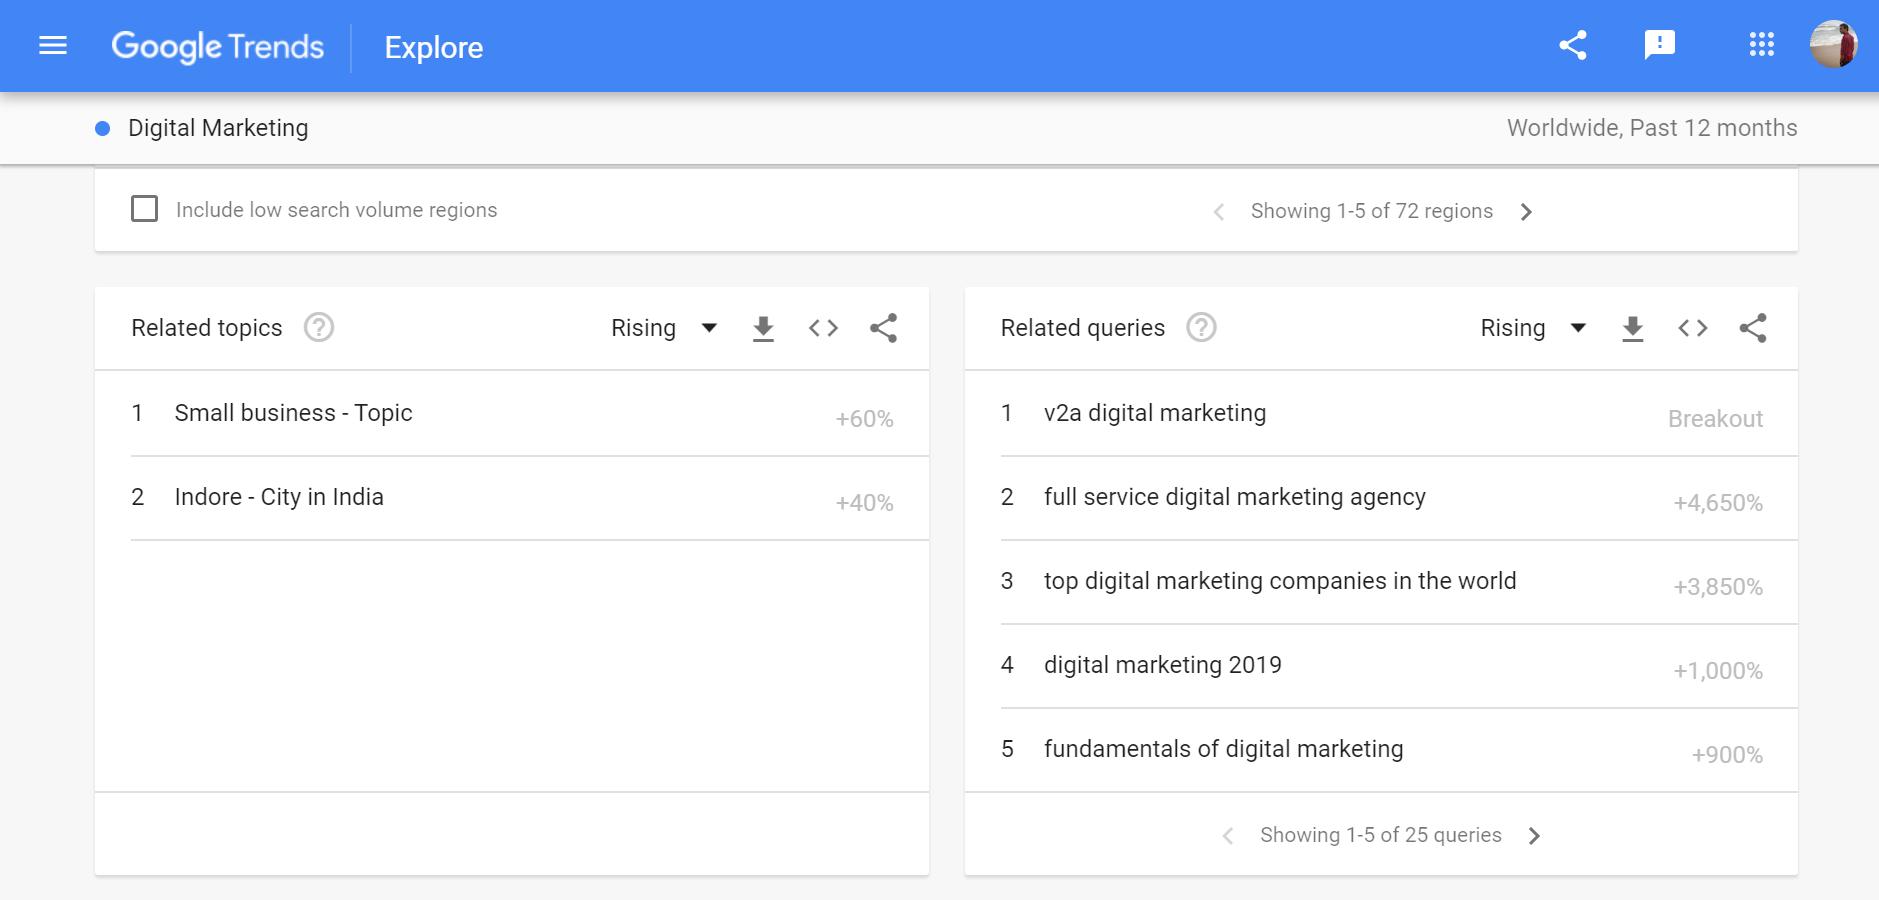 Google Trends Digital Marketing search